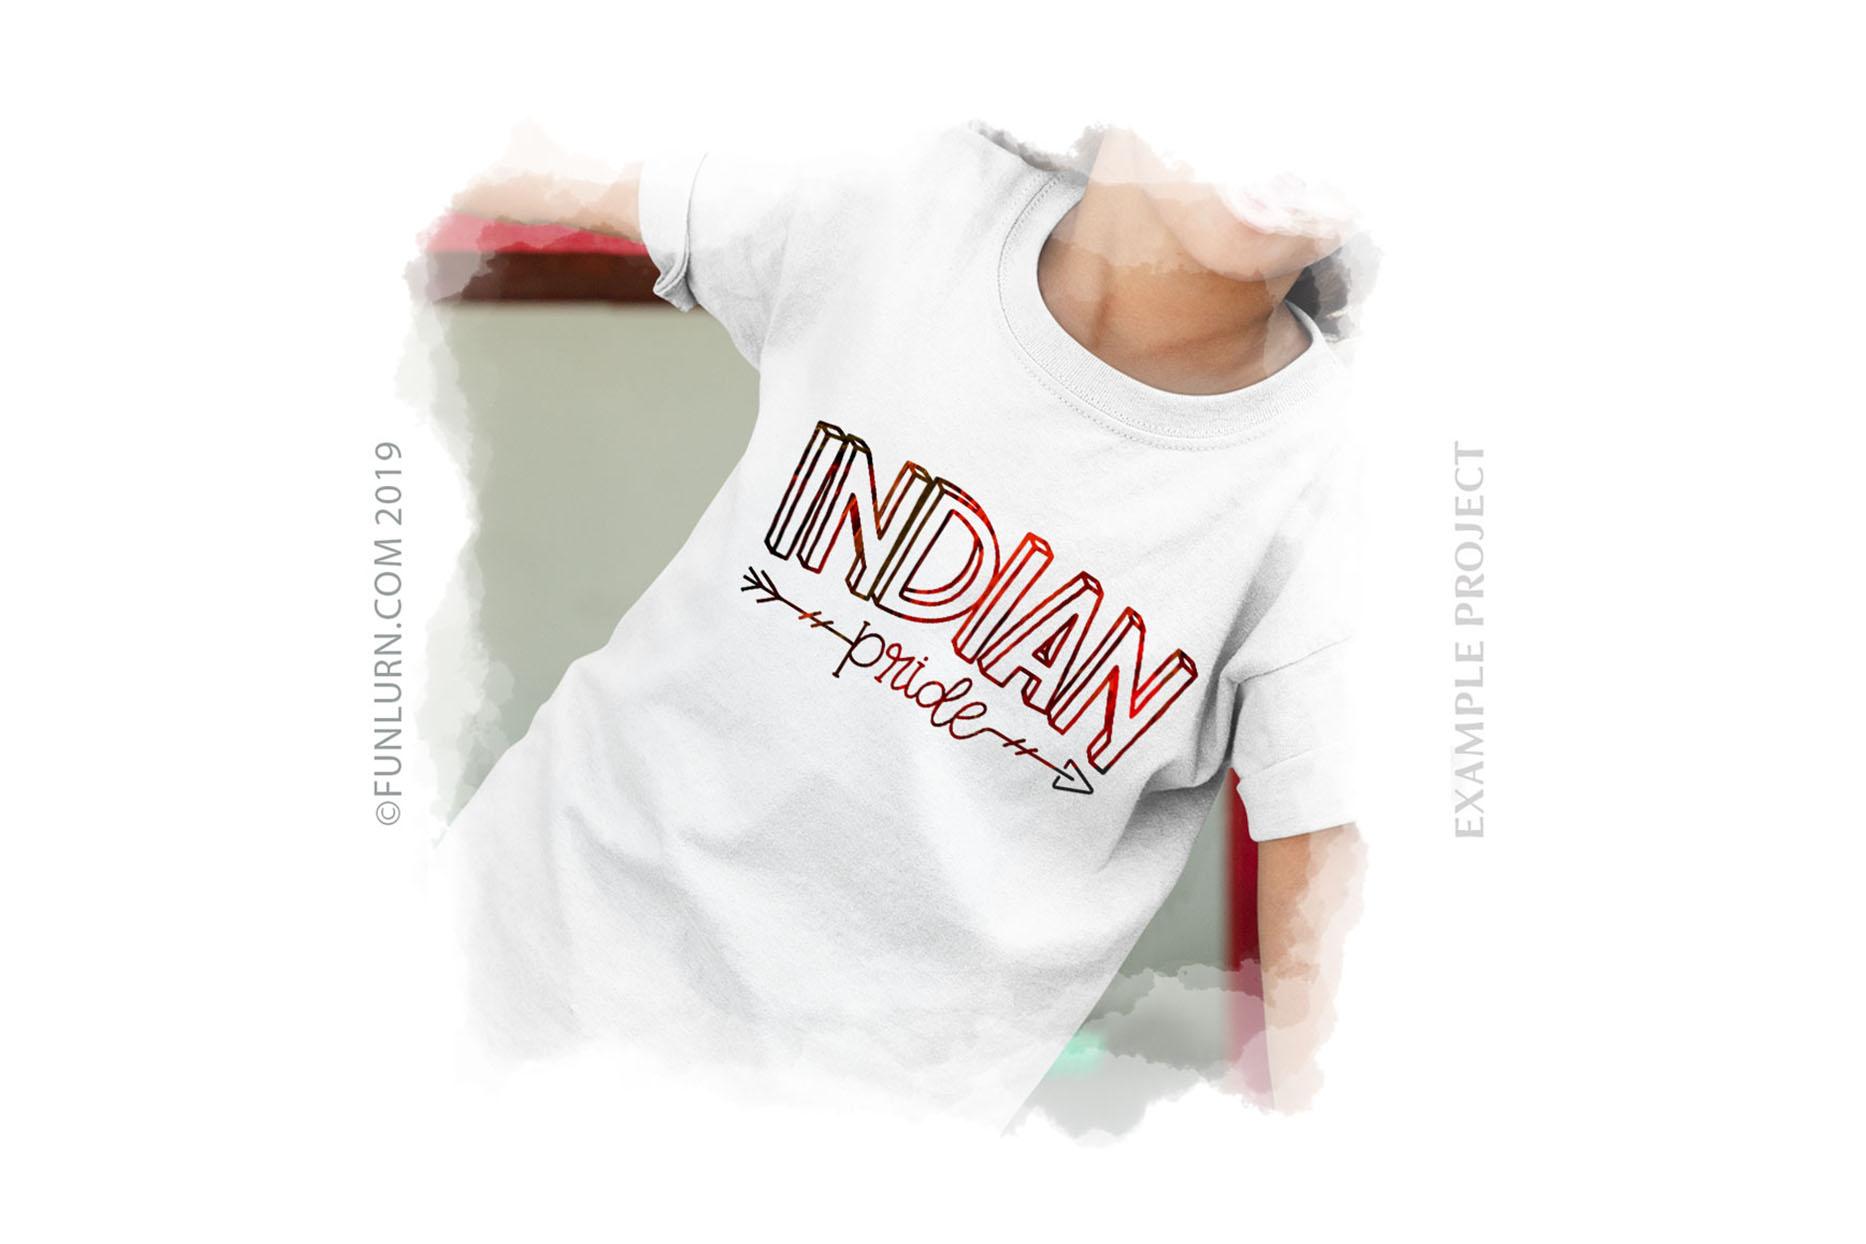 Indian Pride Team SVG Cut File example image 3